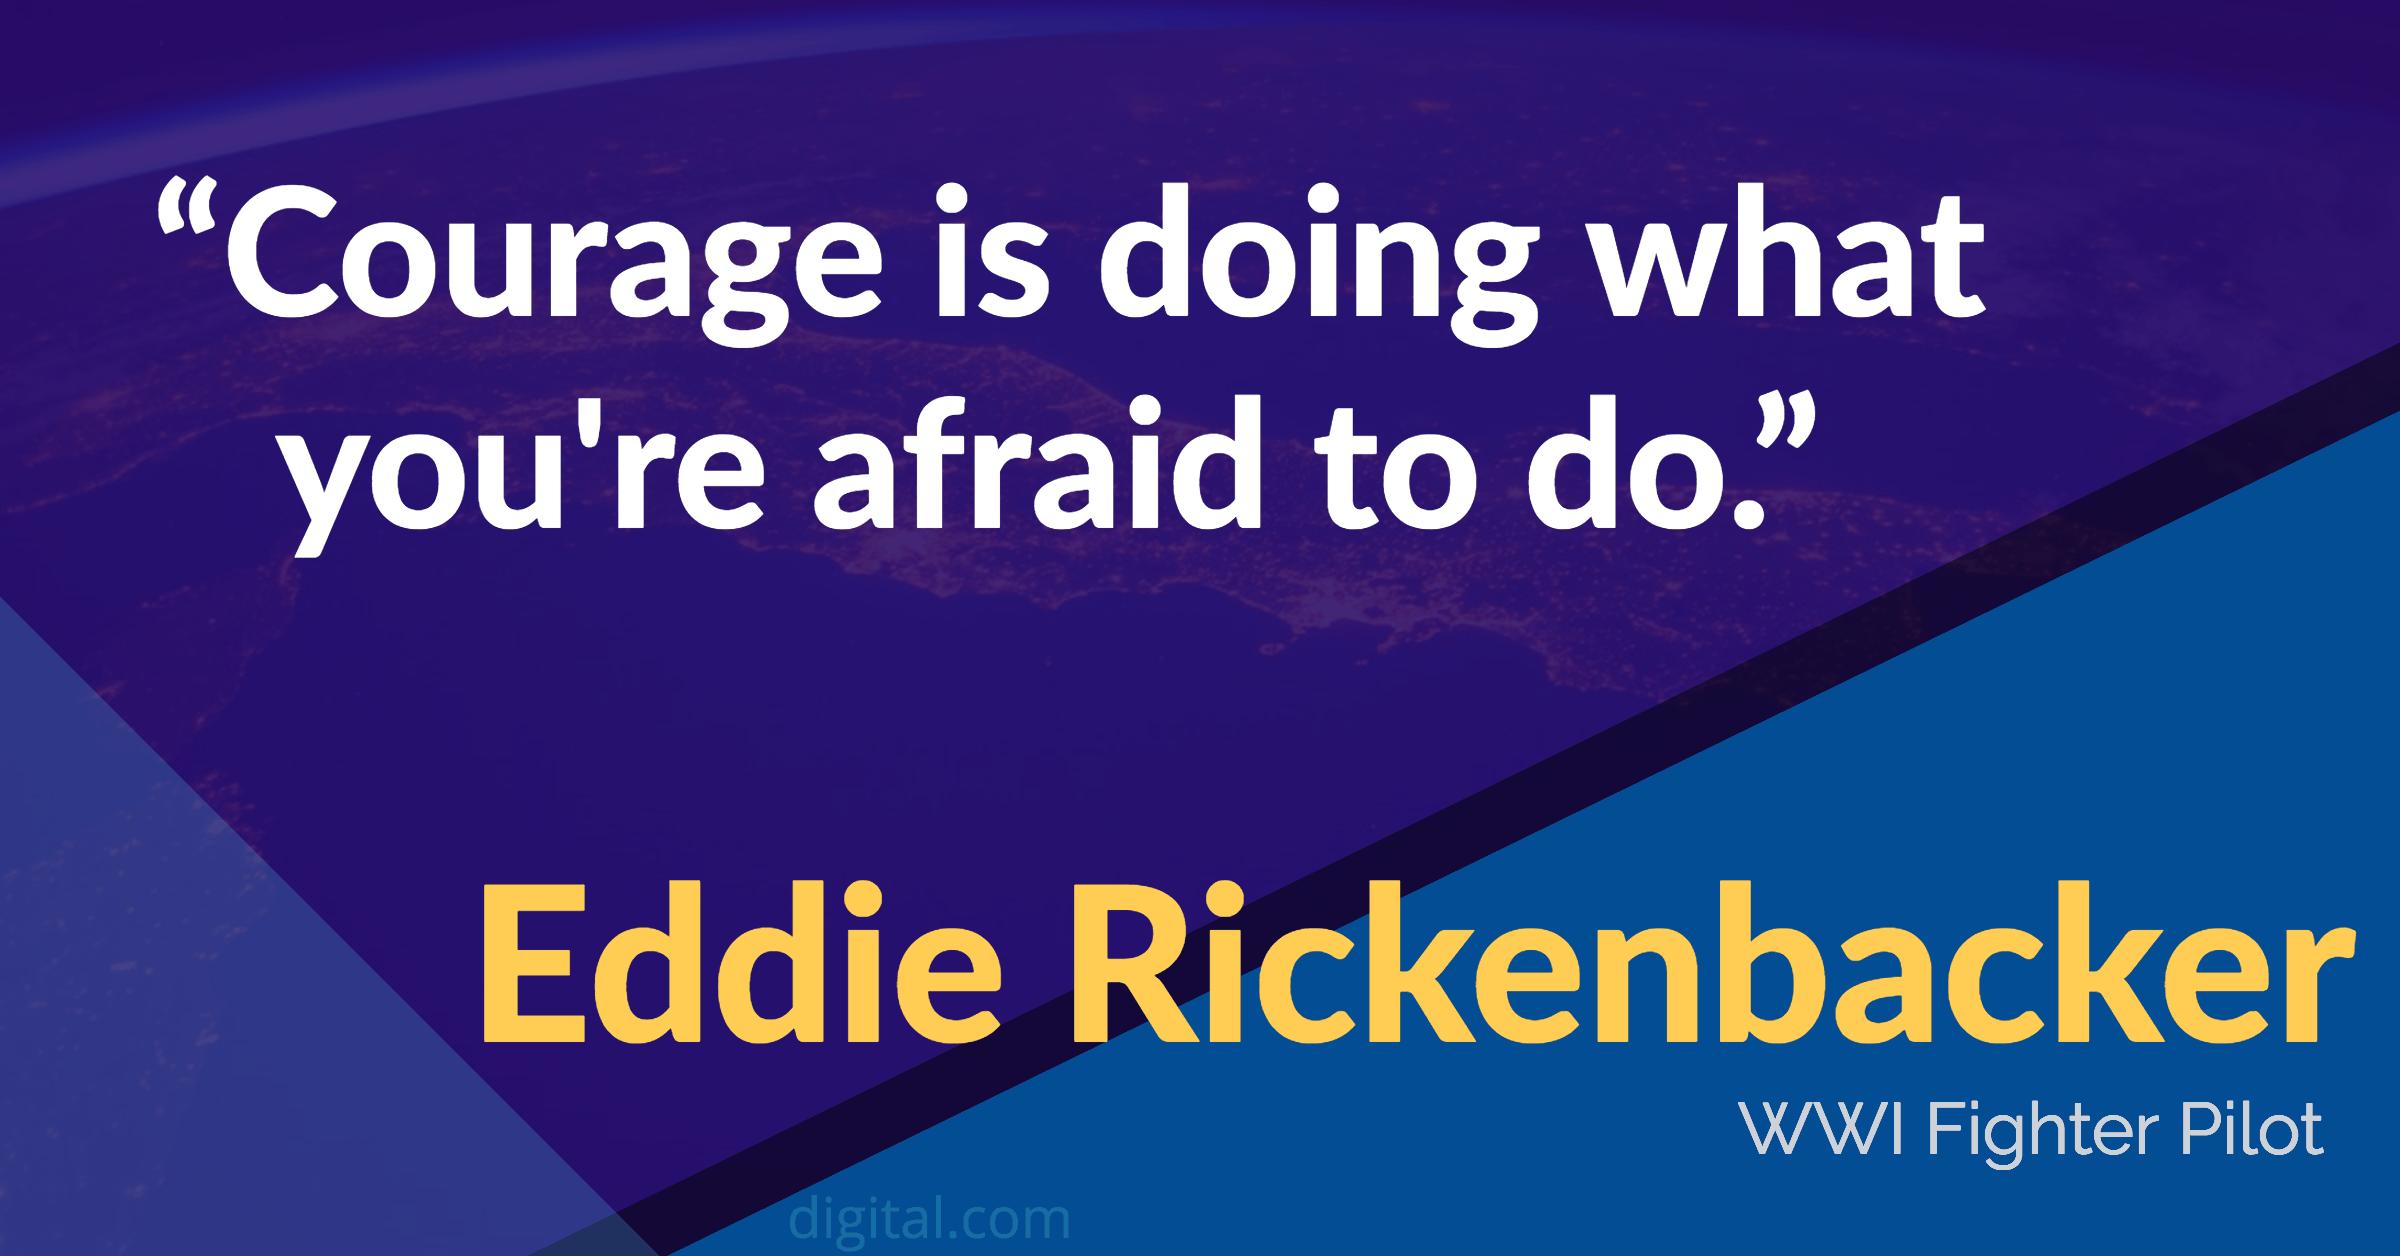 eddie rickenbacker leadership quotes